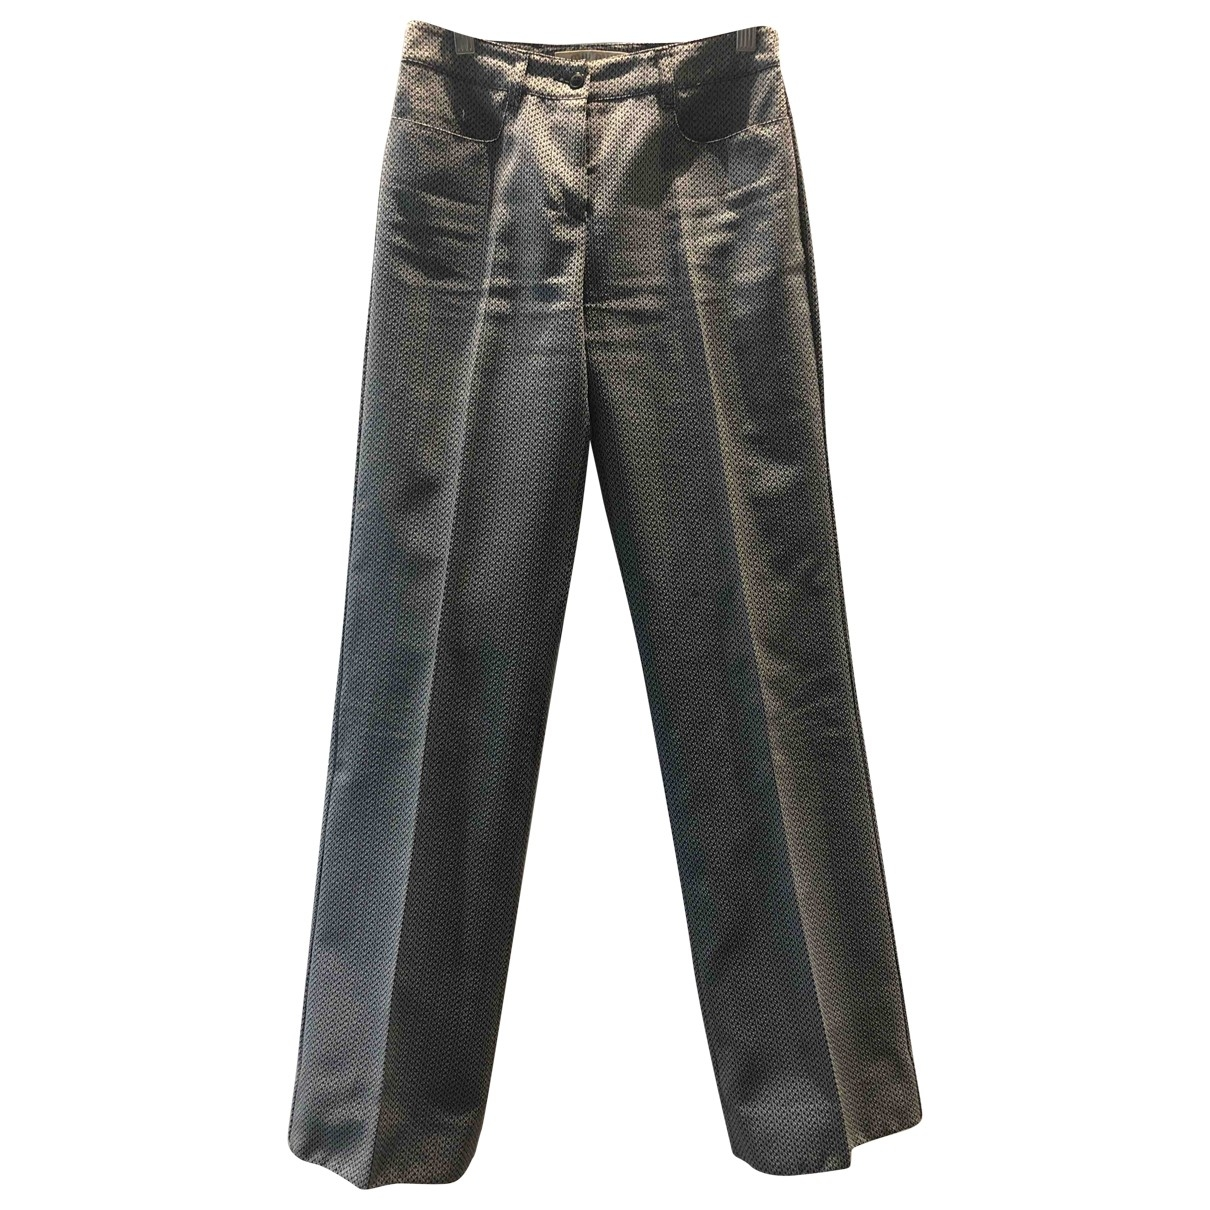 Miu Miu \N Blue Trousers for Women 38 IT